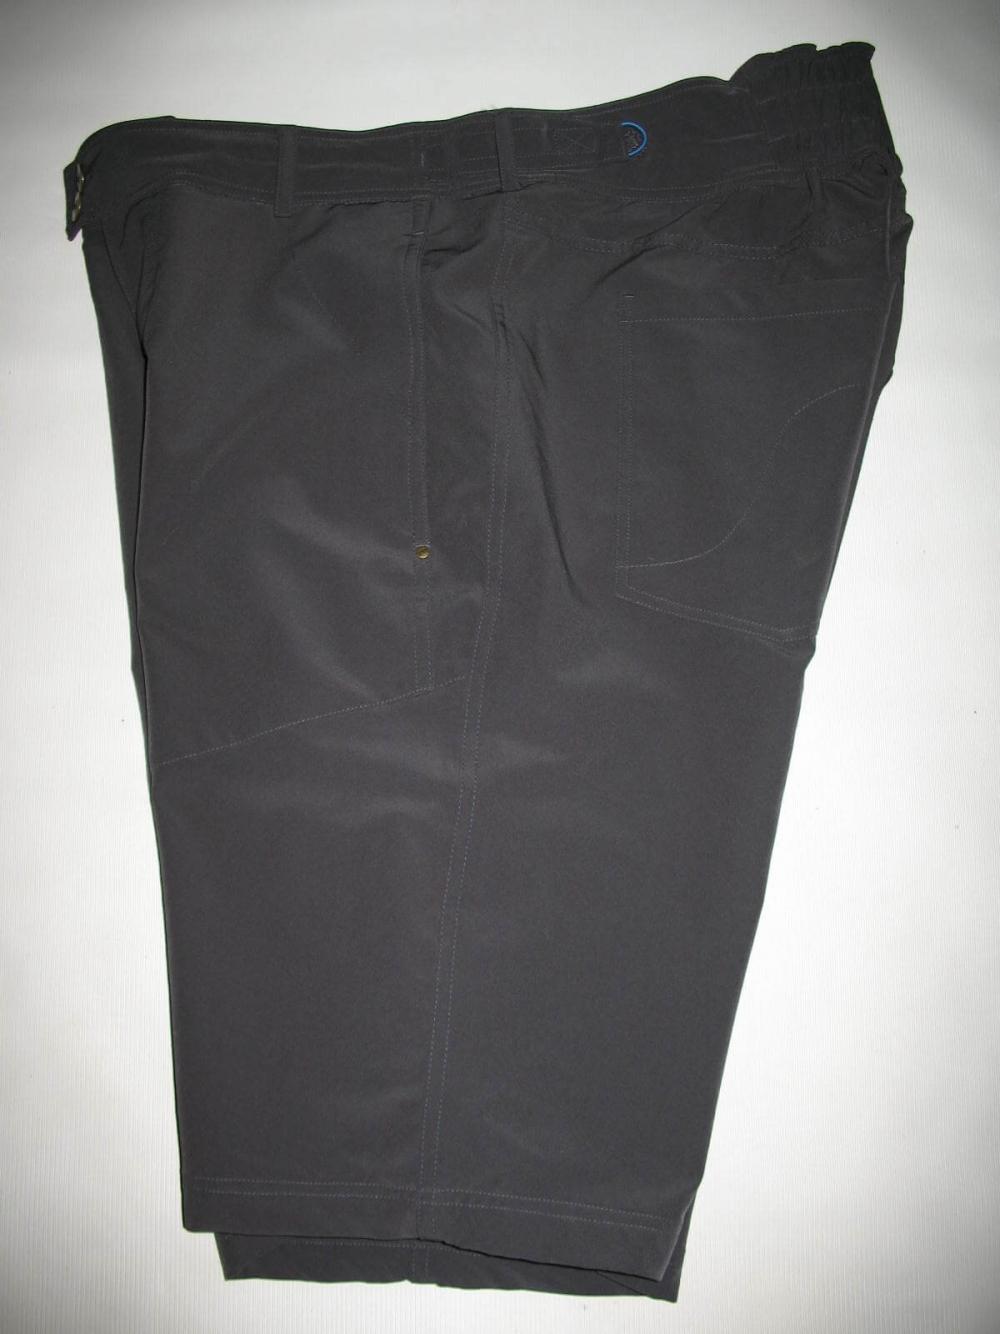 Шорты URBAN ACTIVE bike shorts (размер M/L) - 4